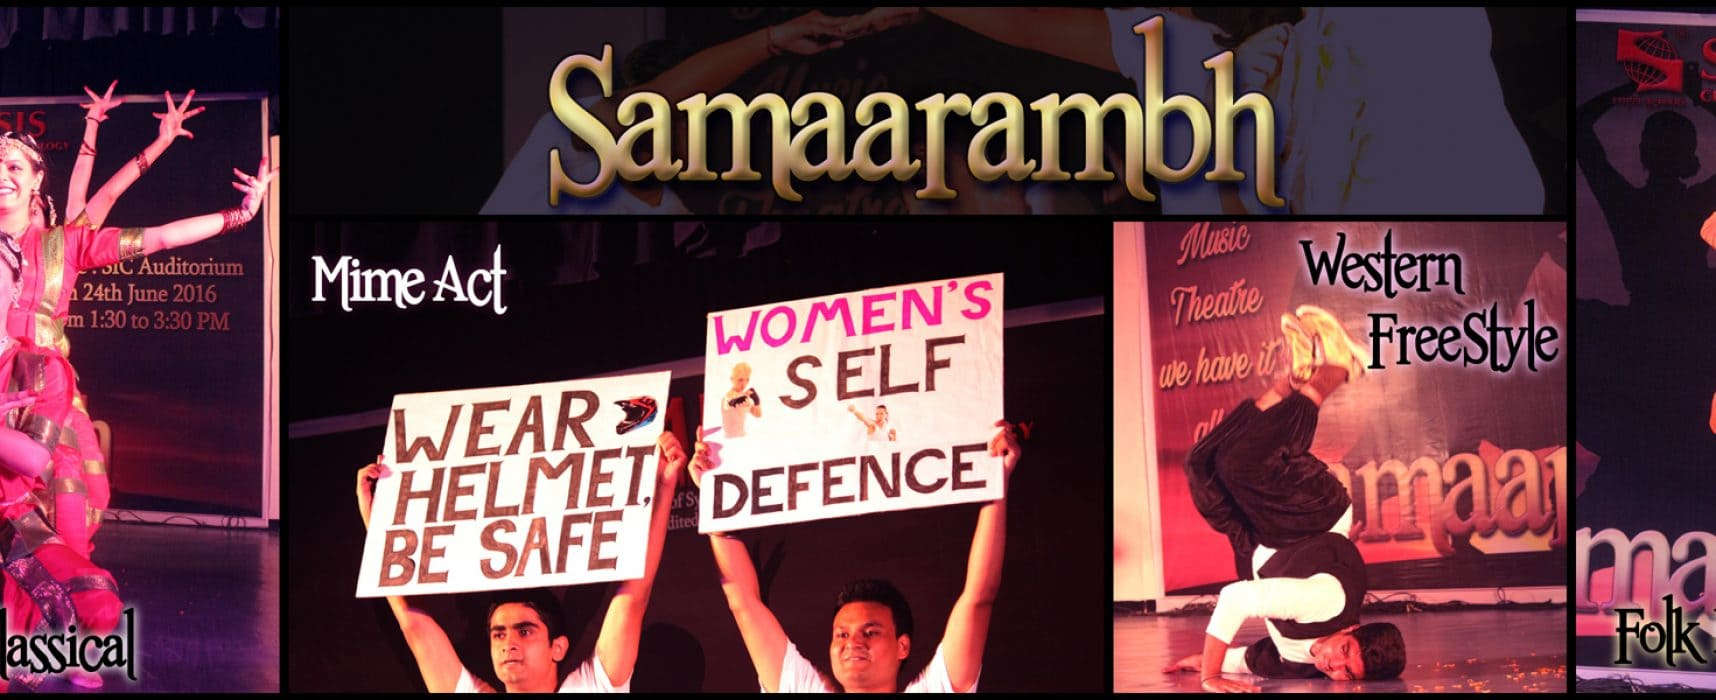 Samaarambh'16